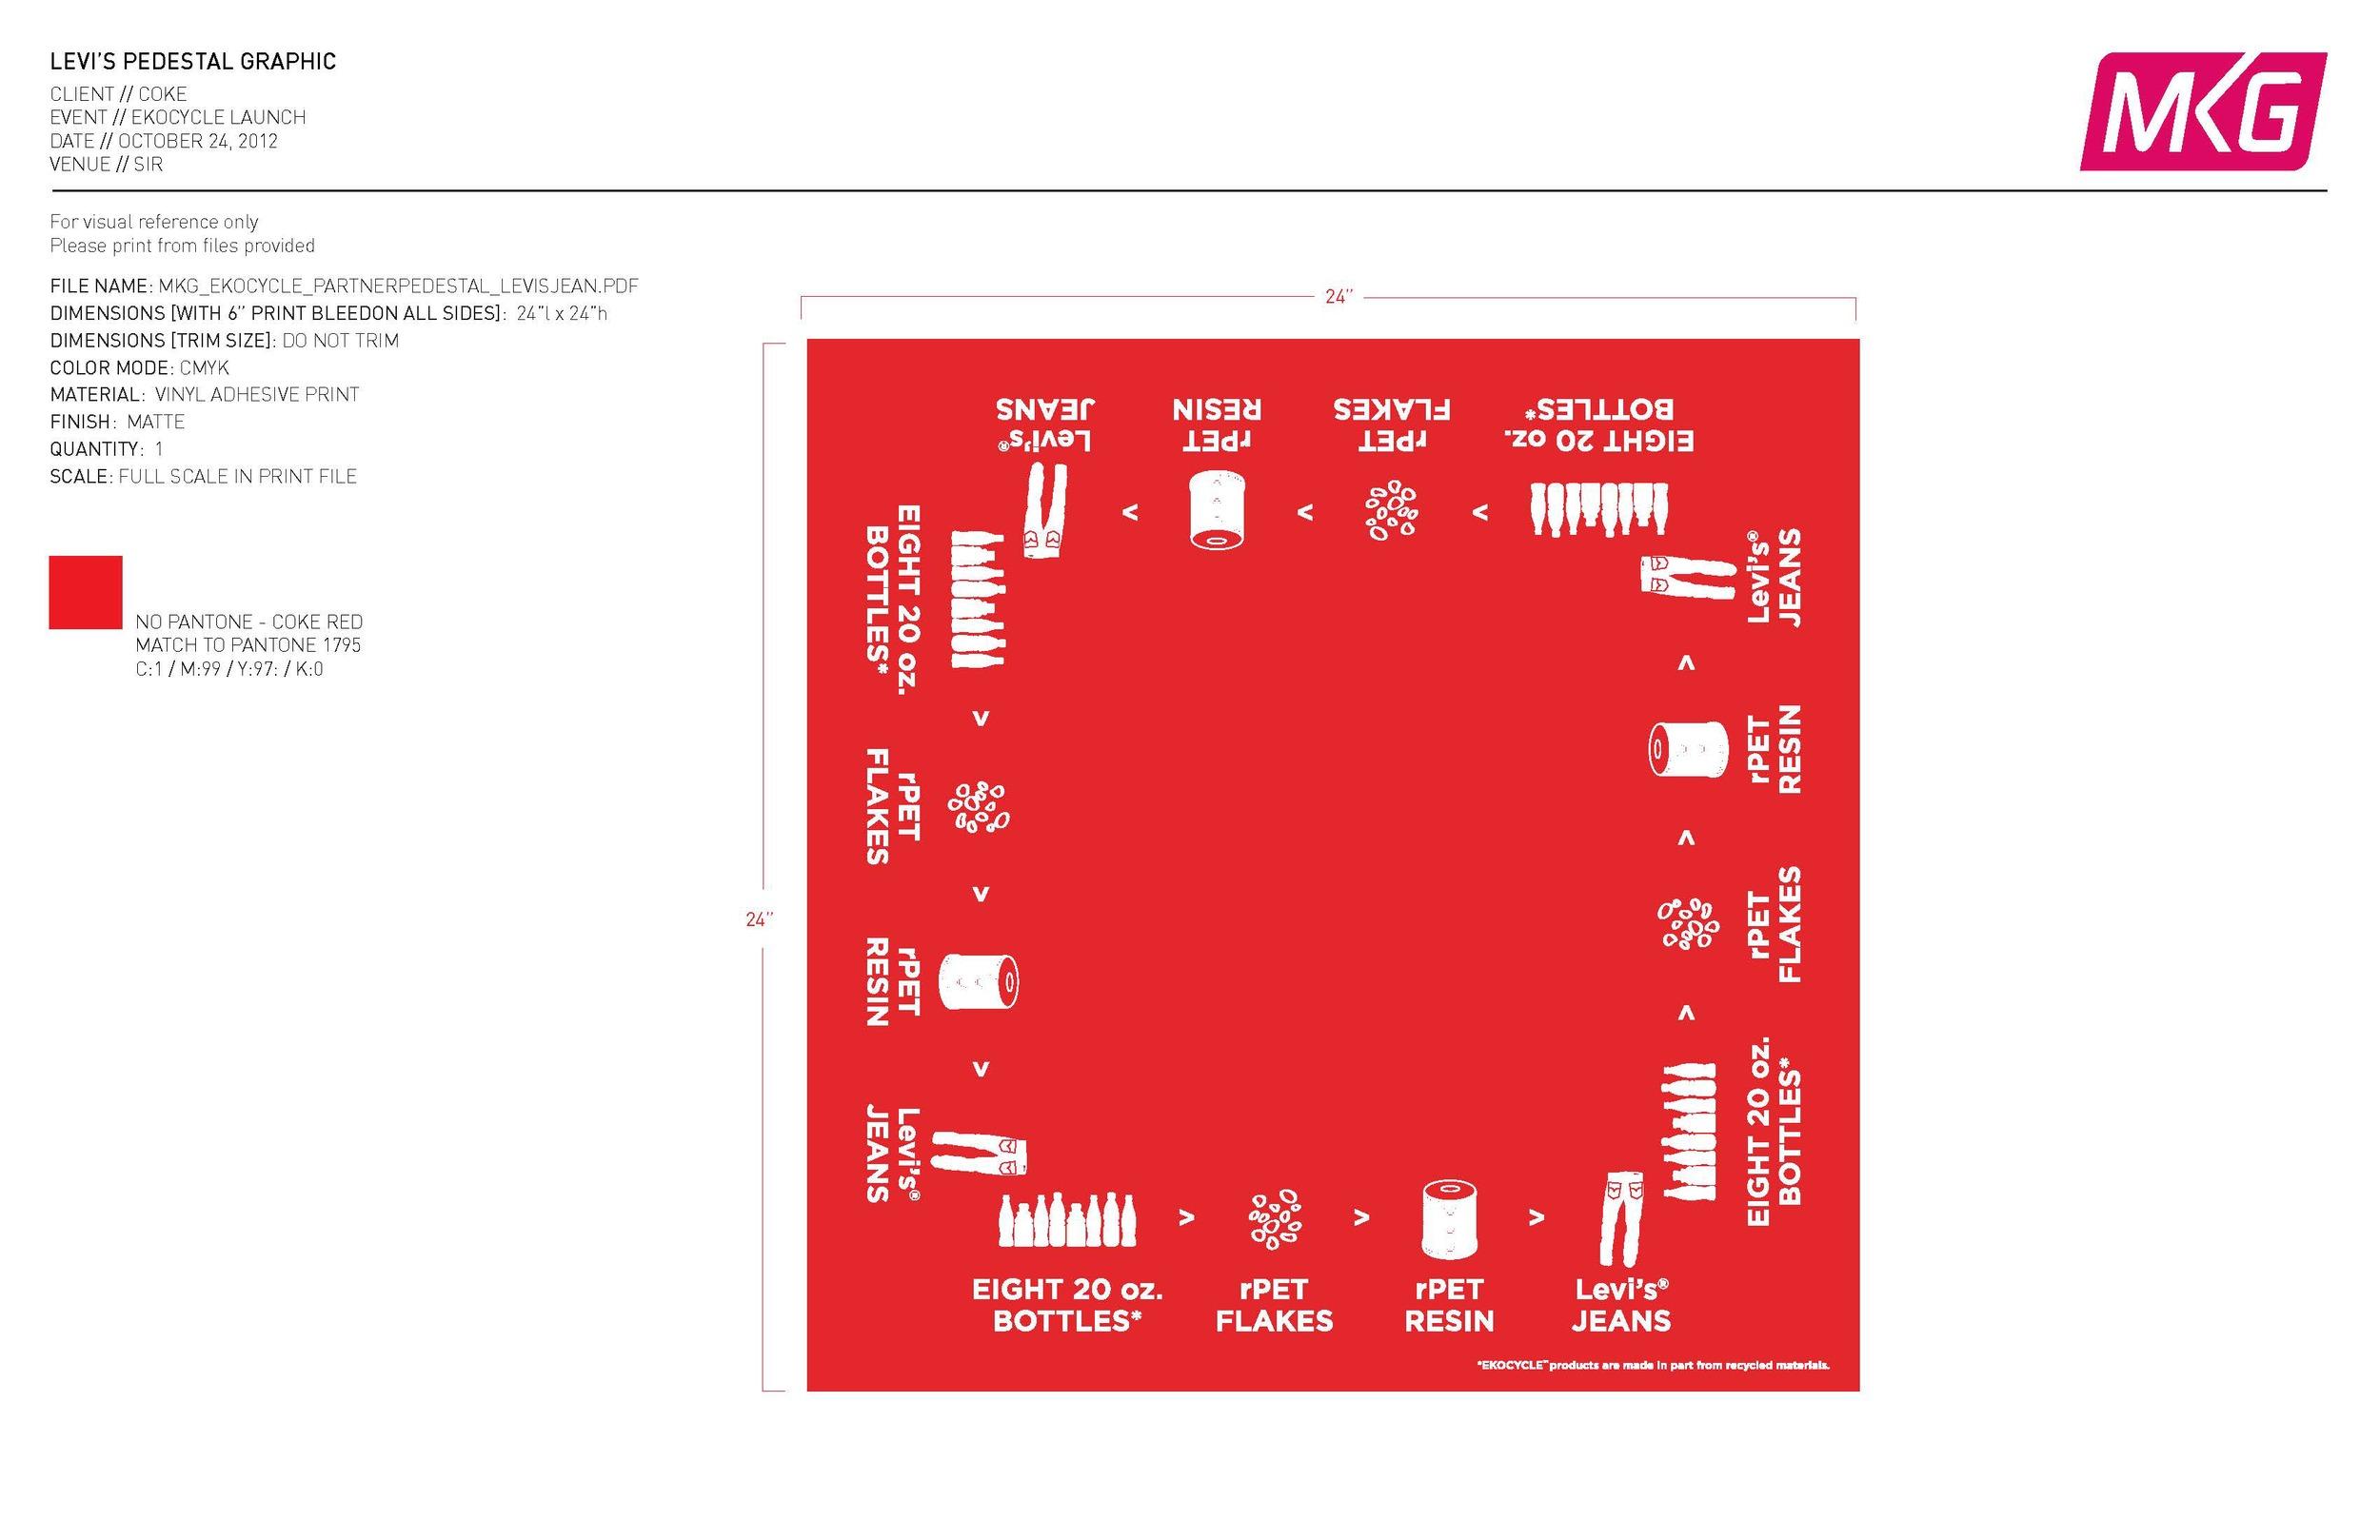 MKG_EKOCYCLE_PEDESTALGRAPHICS_MECH_10_22_Page_3.jpg